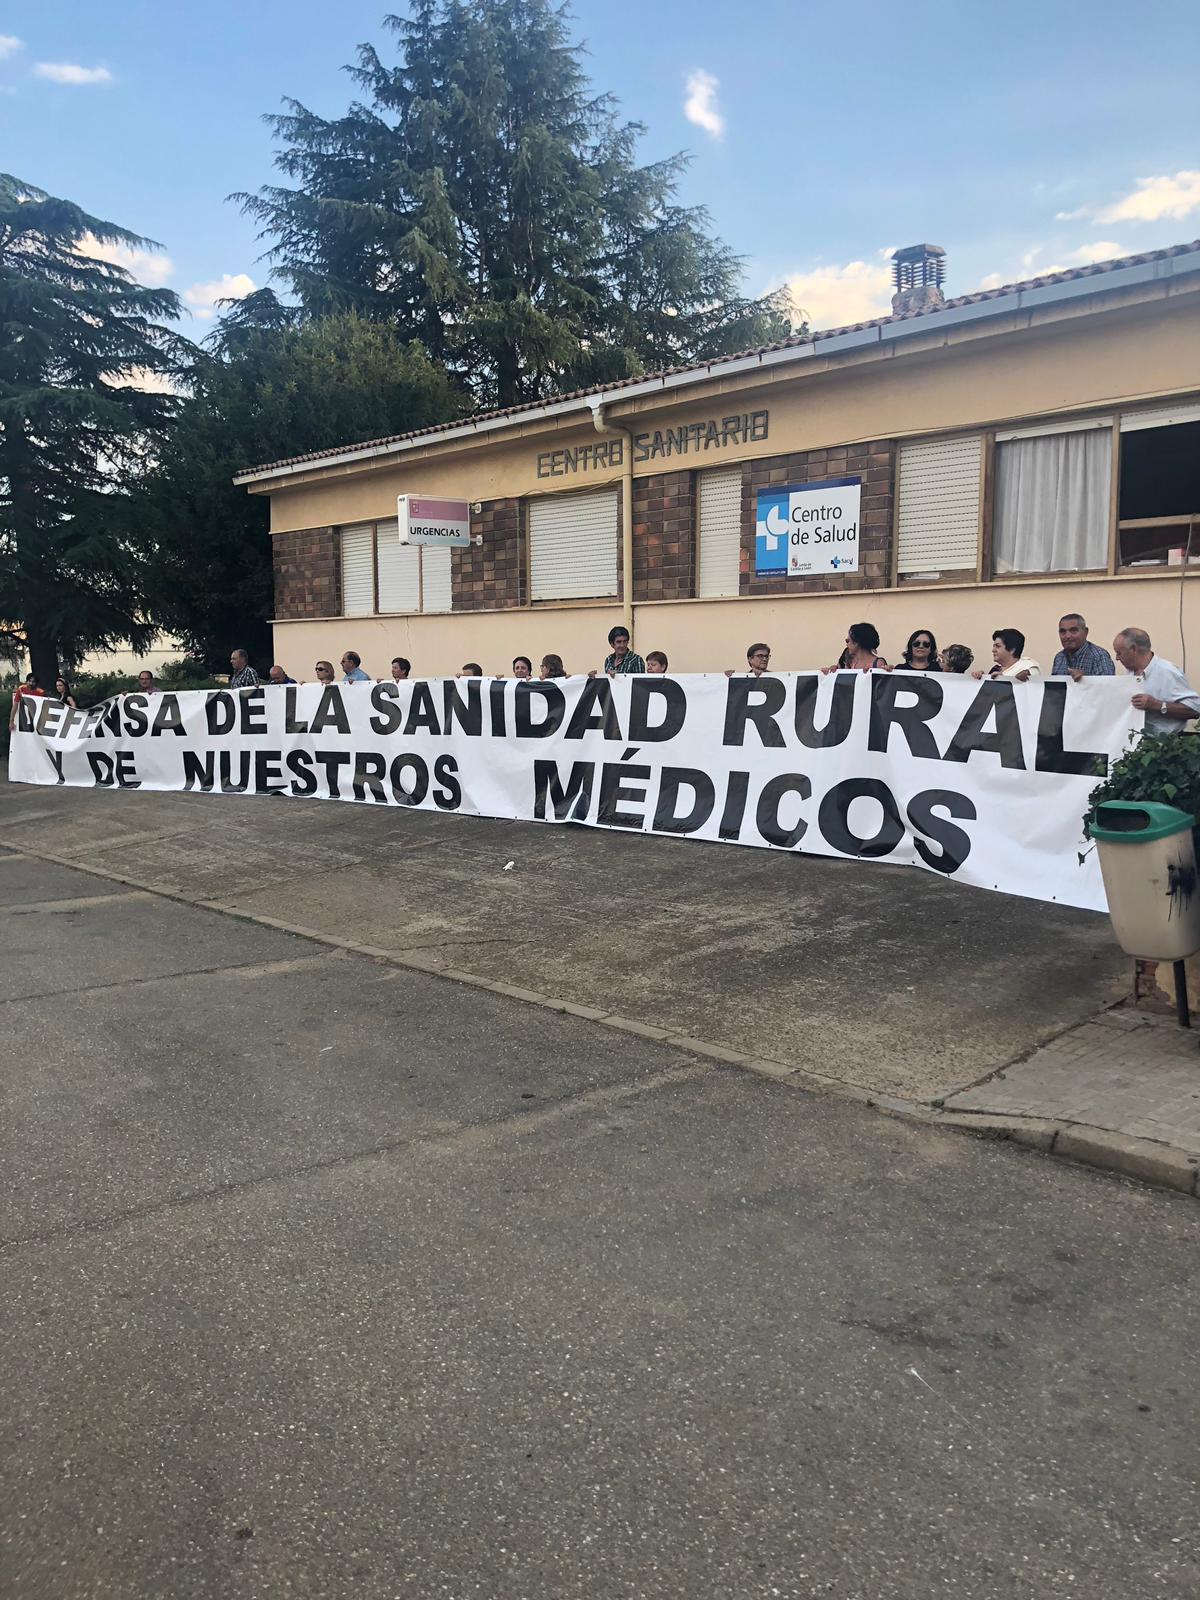 https://static.leonoticias.com/www/multimedia/201809/12/media/VALDERAS/135.jpeg